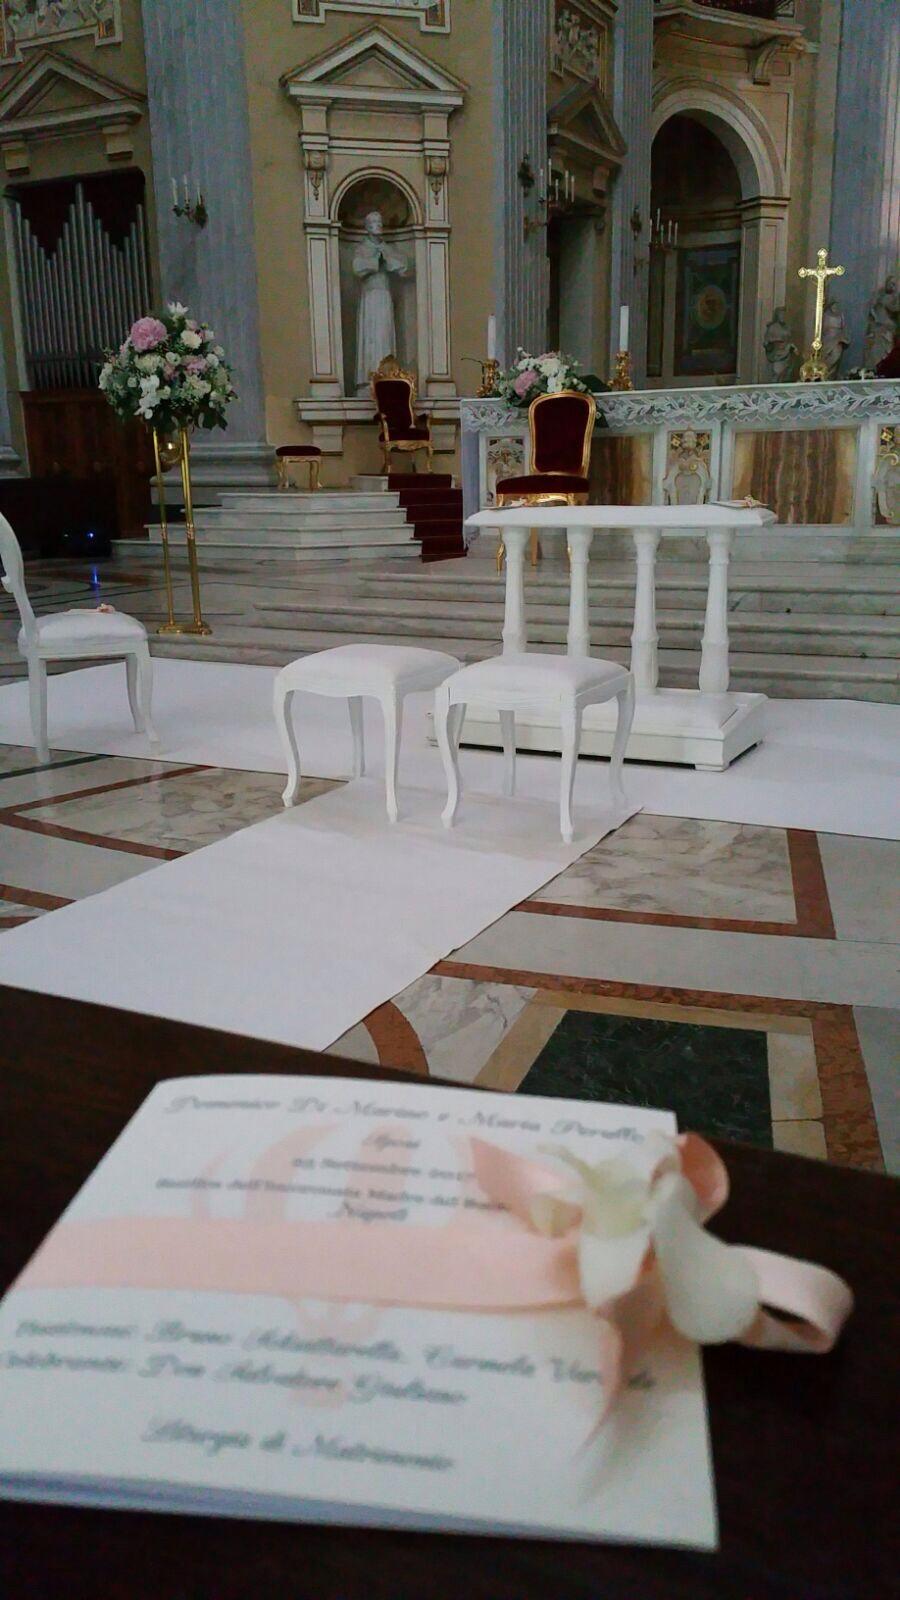 http://www.weddingamalfi.com/wp-content/uploads/Domenico-and-Maria-Wedding-Amalfi-church-decoration.jpg